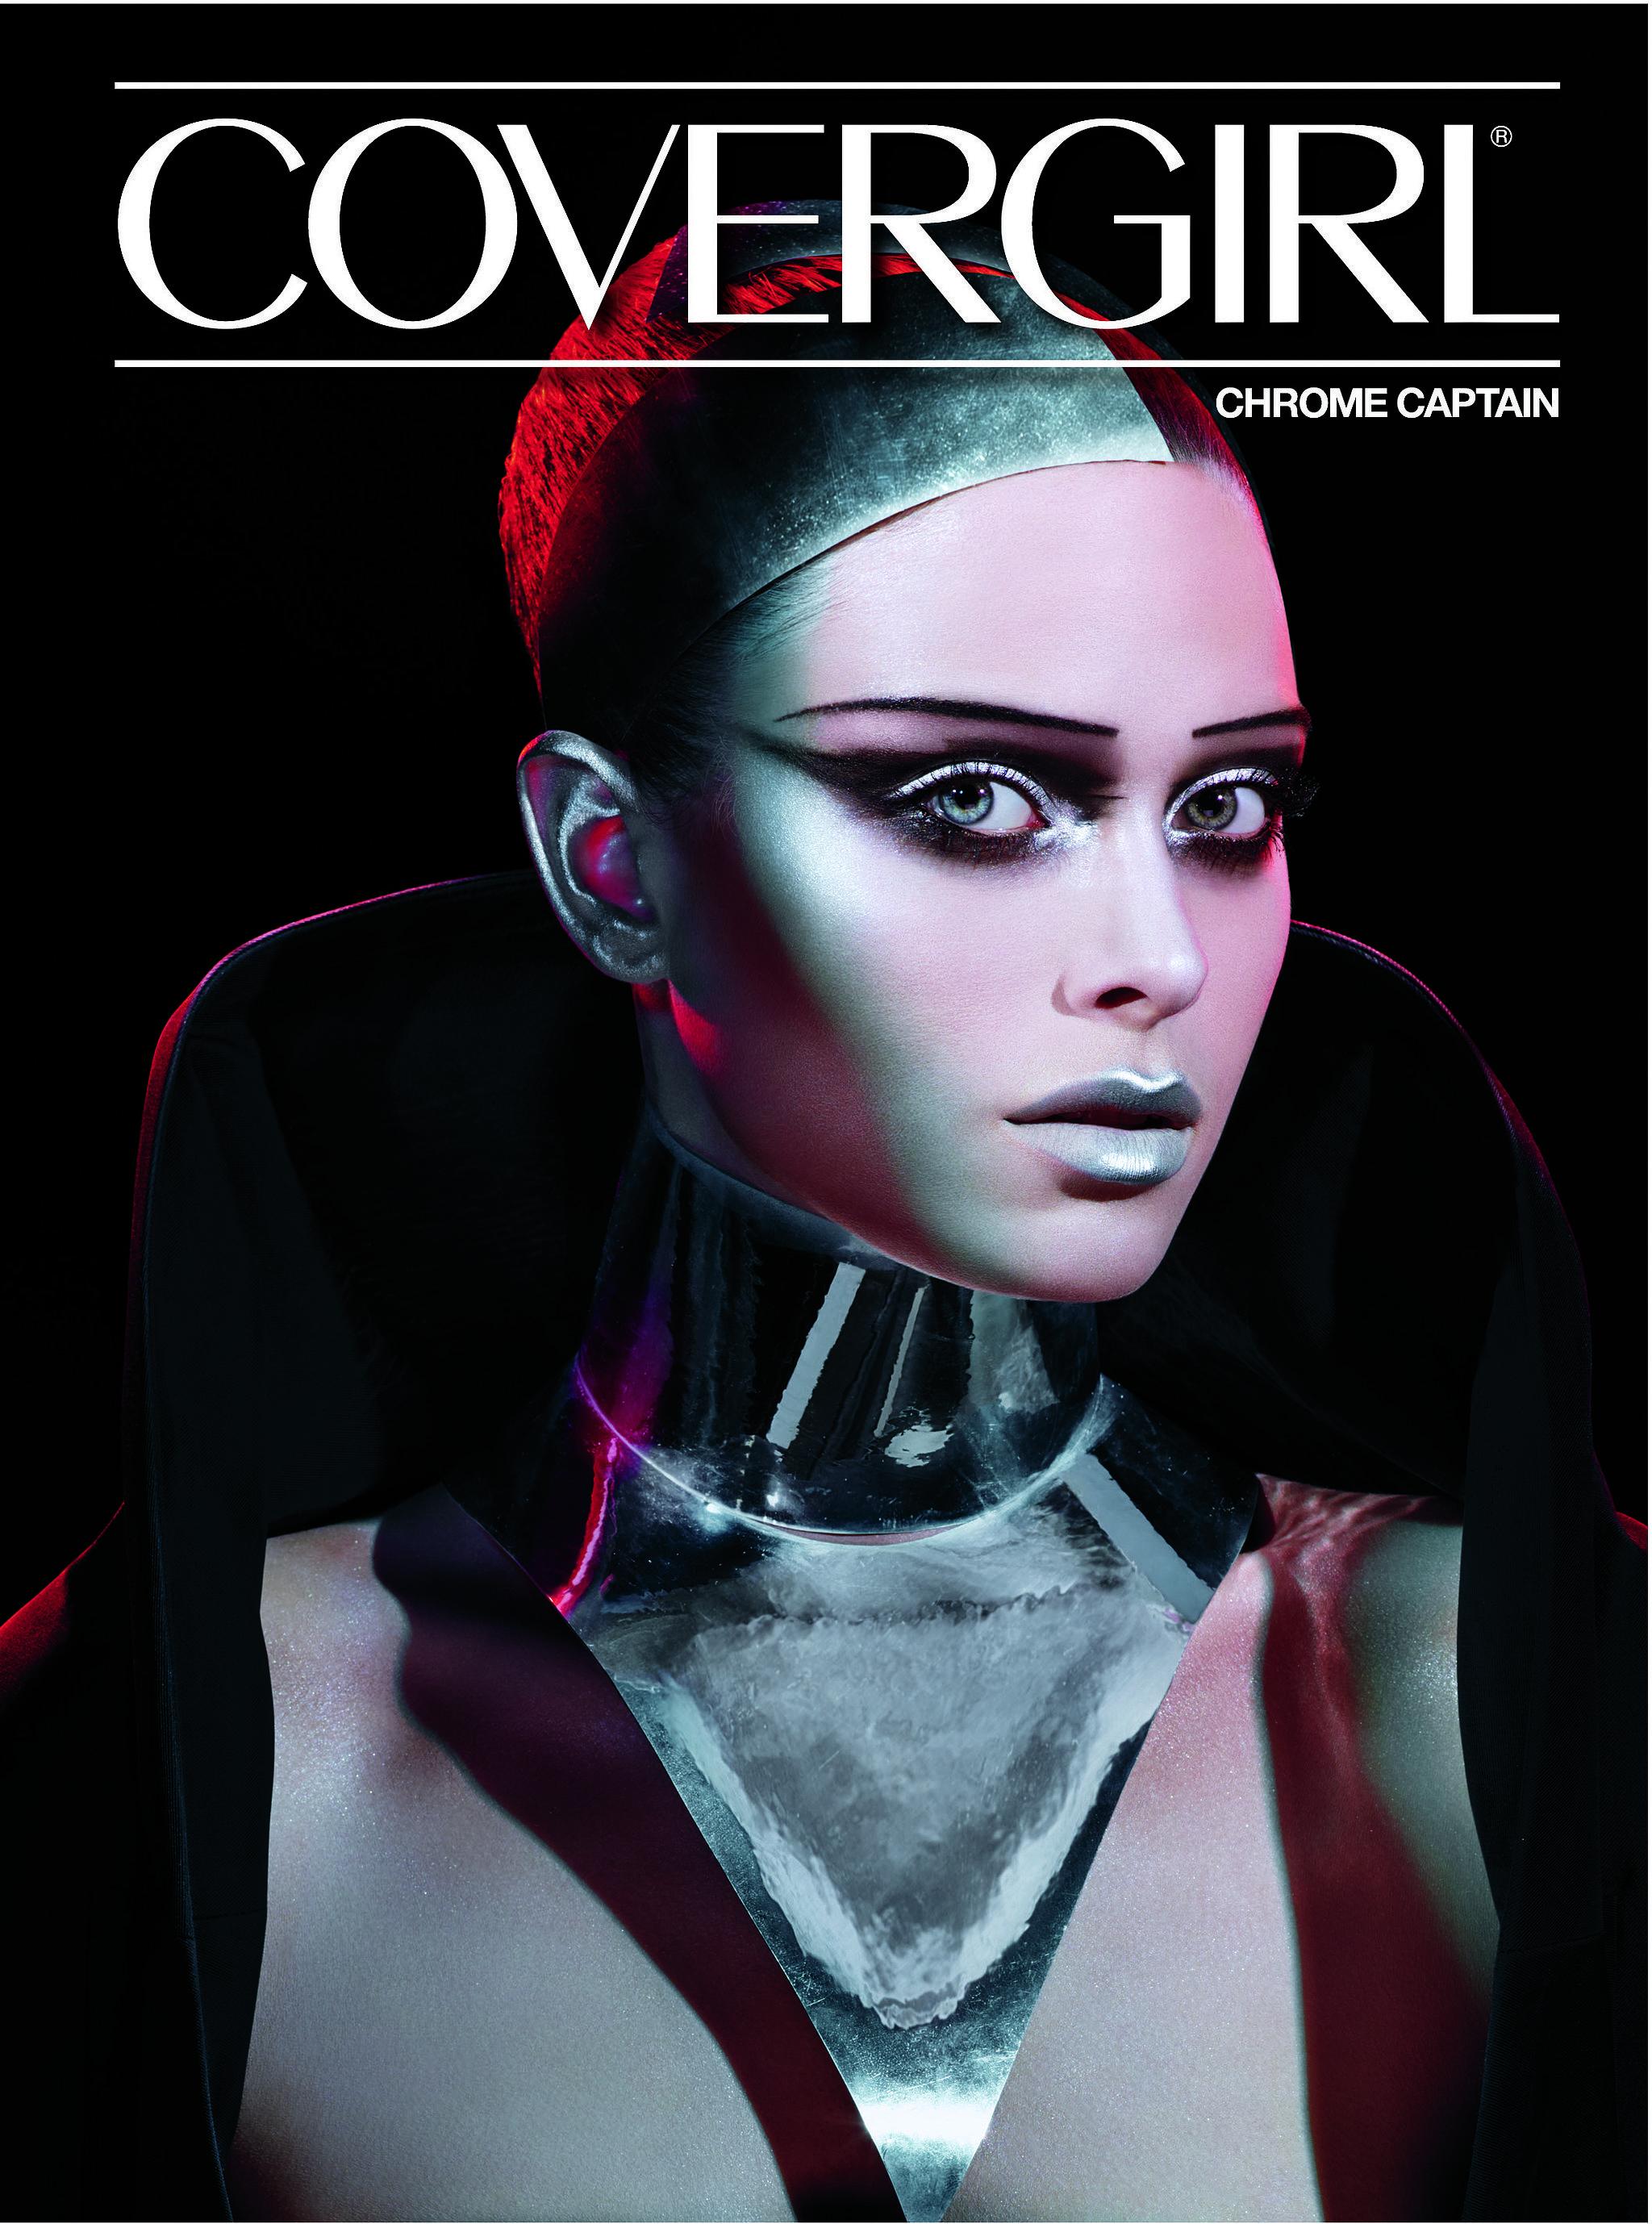 CoverGirl-Chrome-Captain-Look.jpg